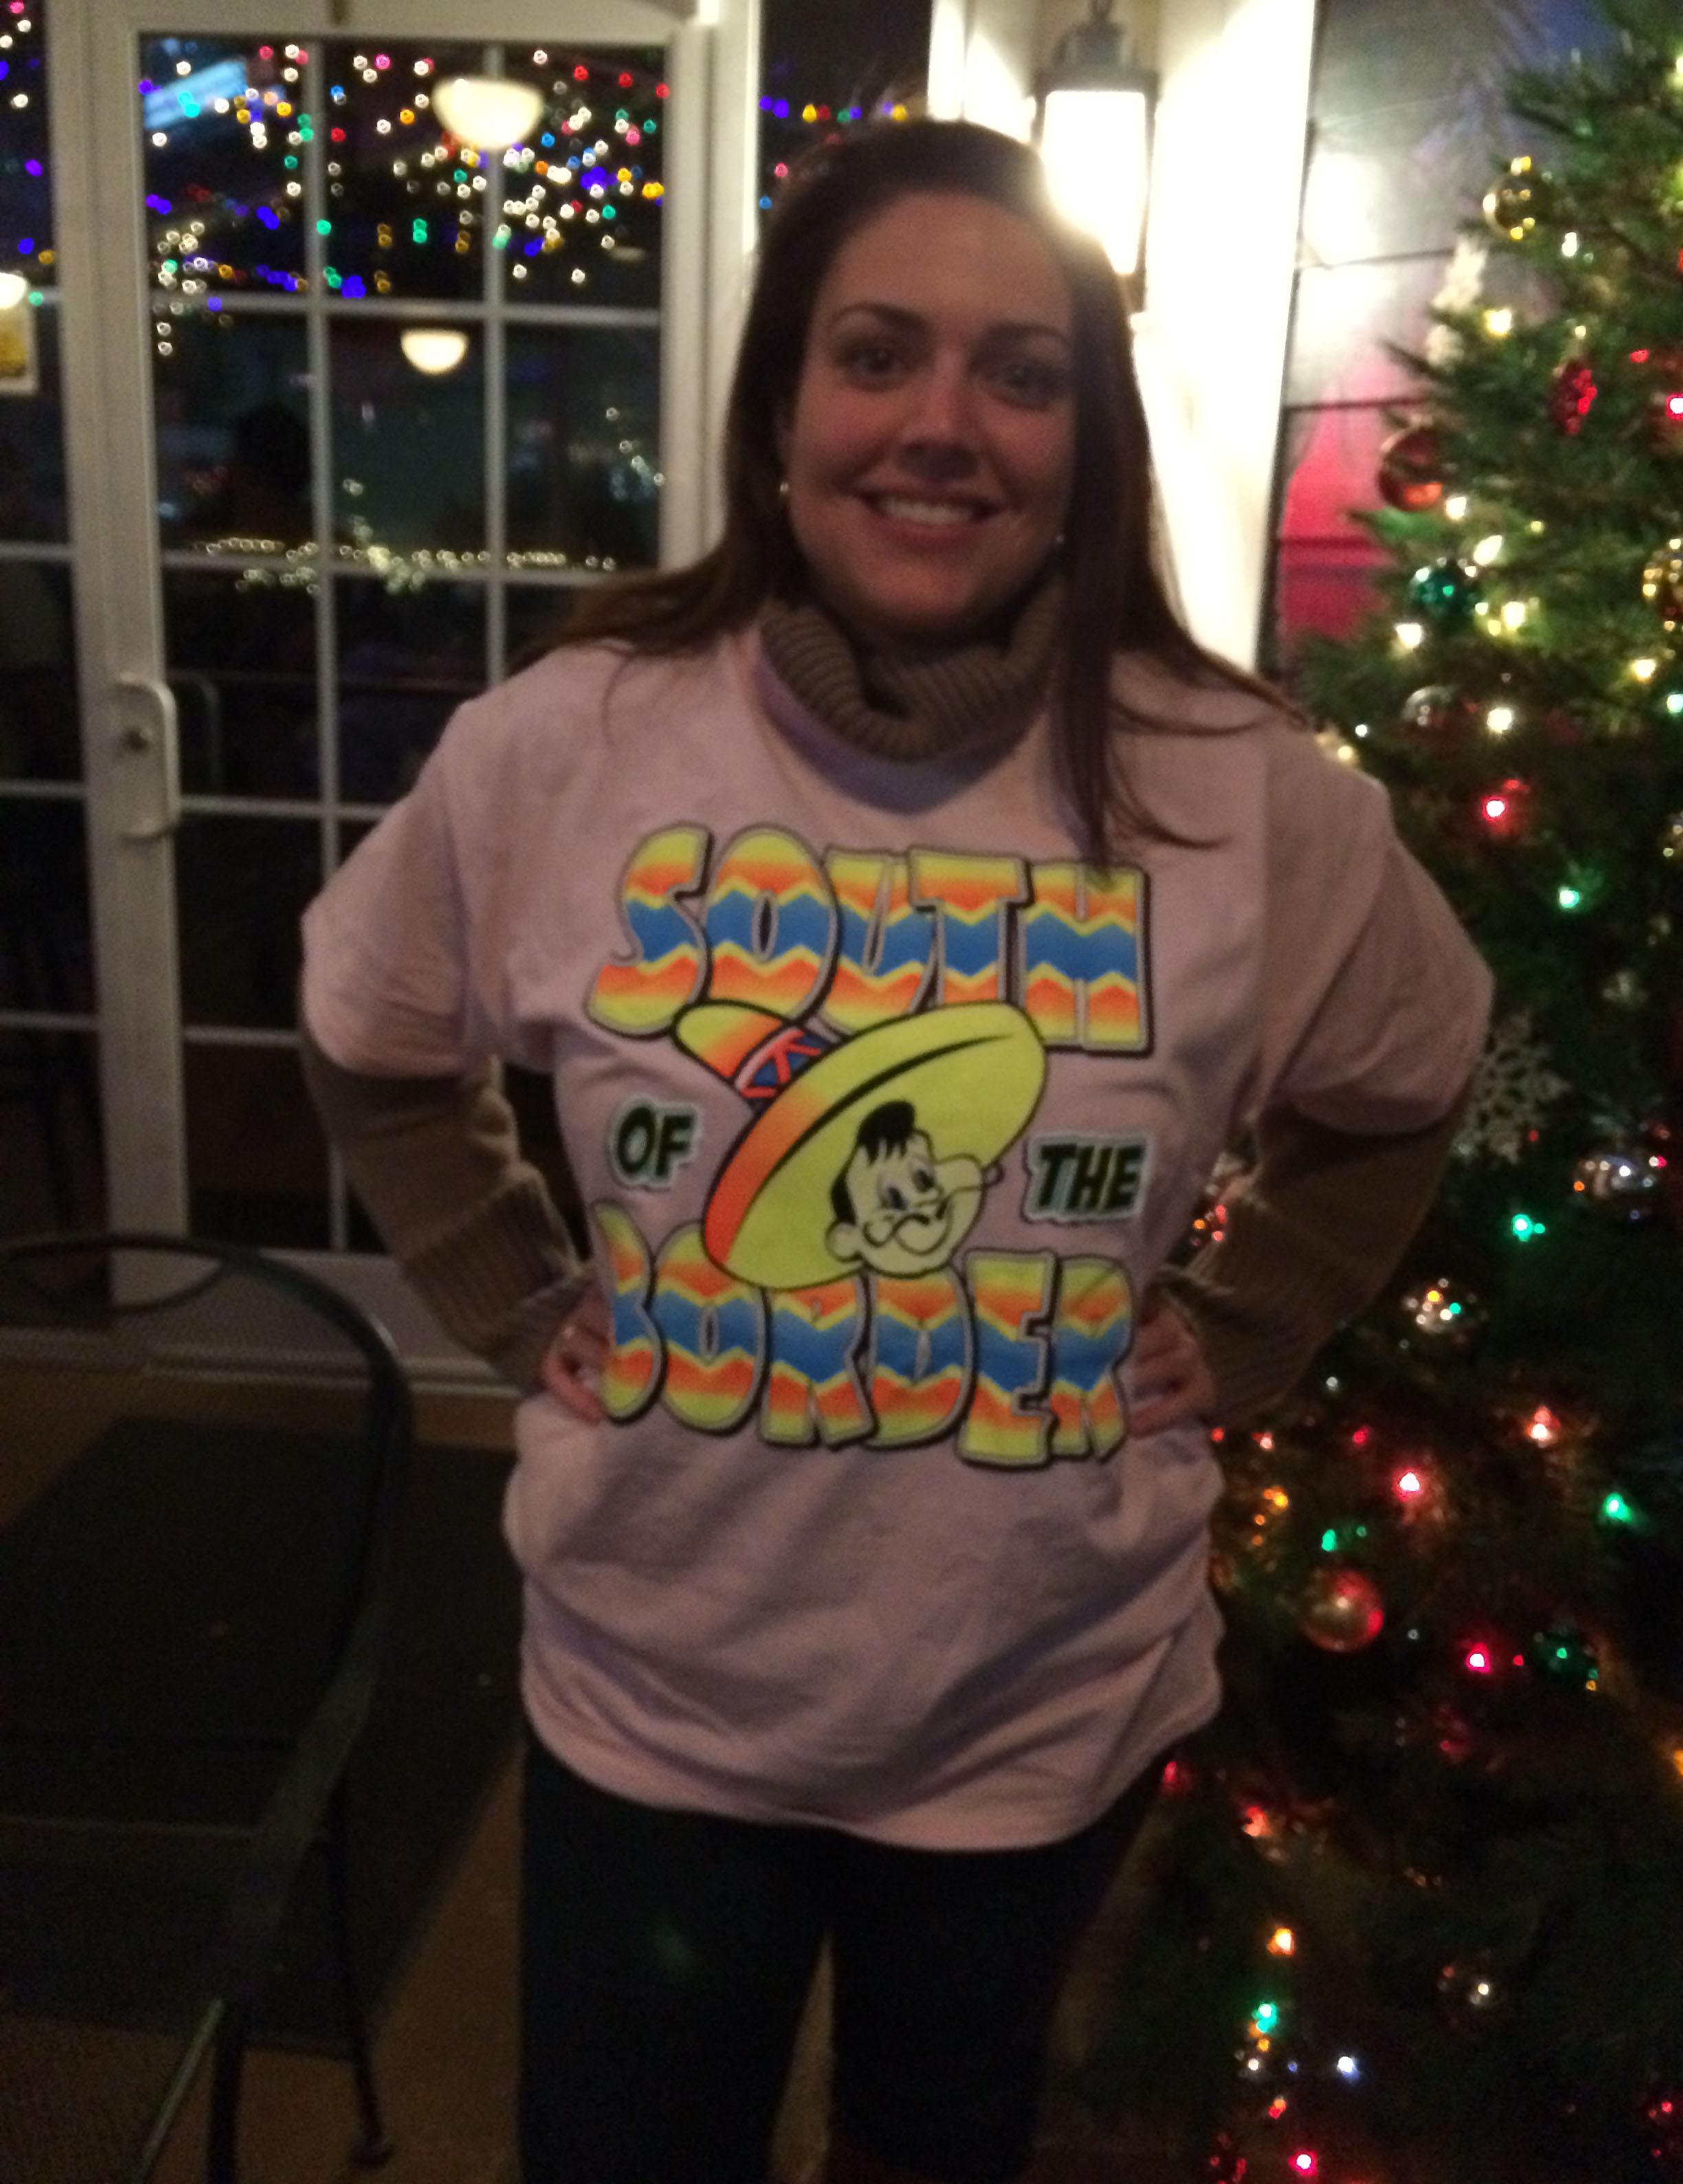 Sidney wearing her super tacky tourist shirt.